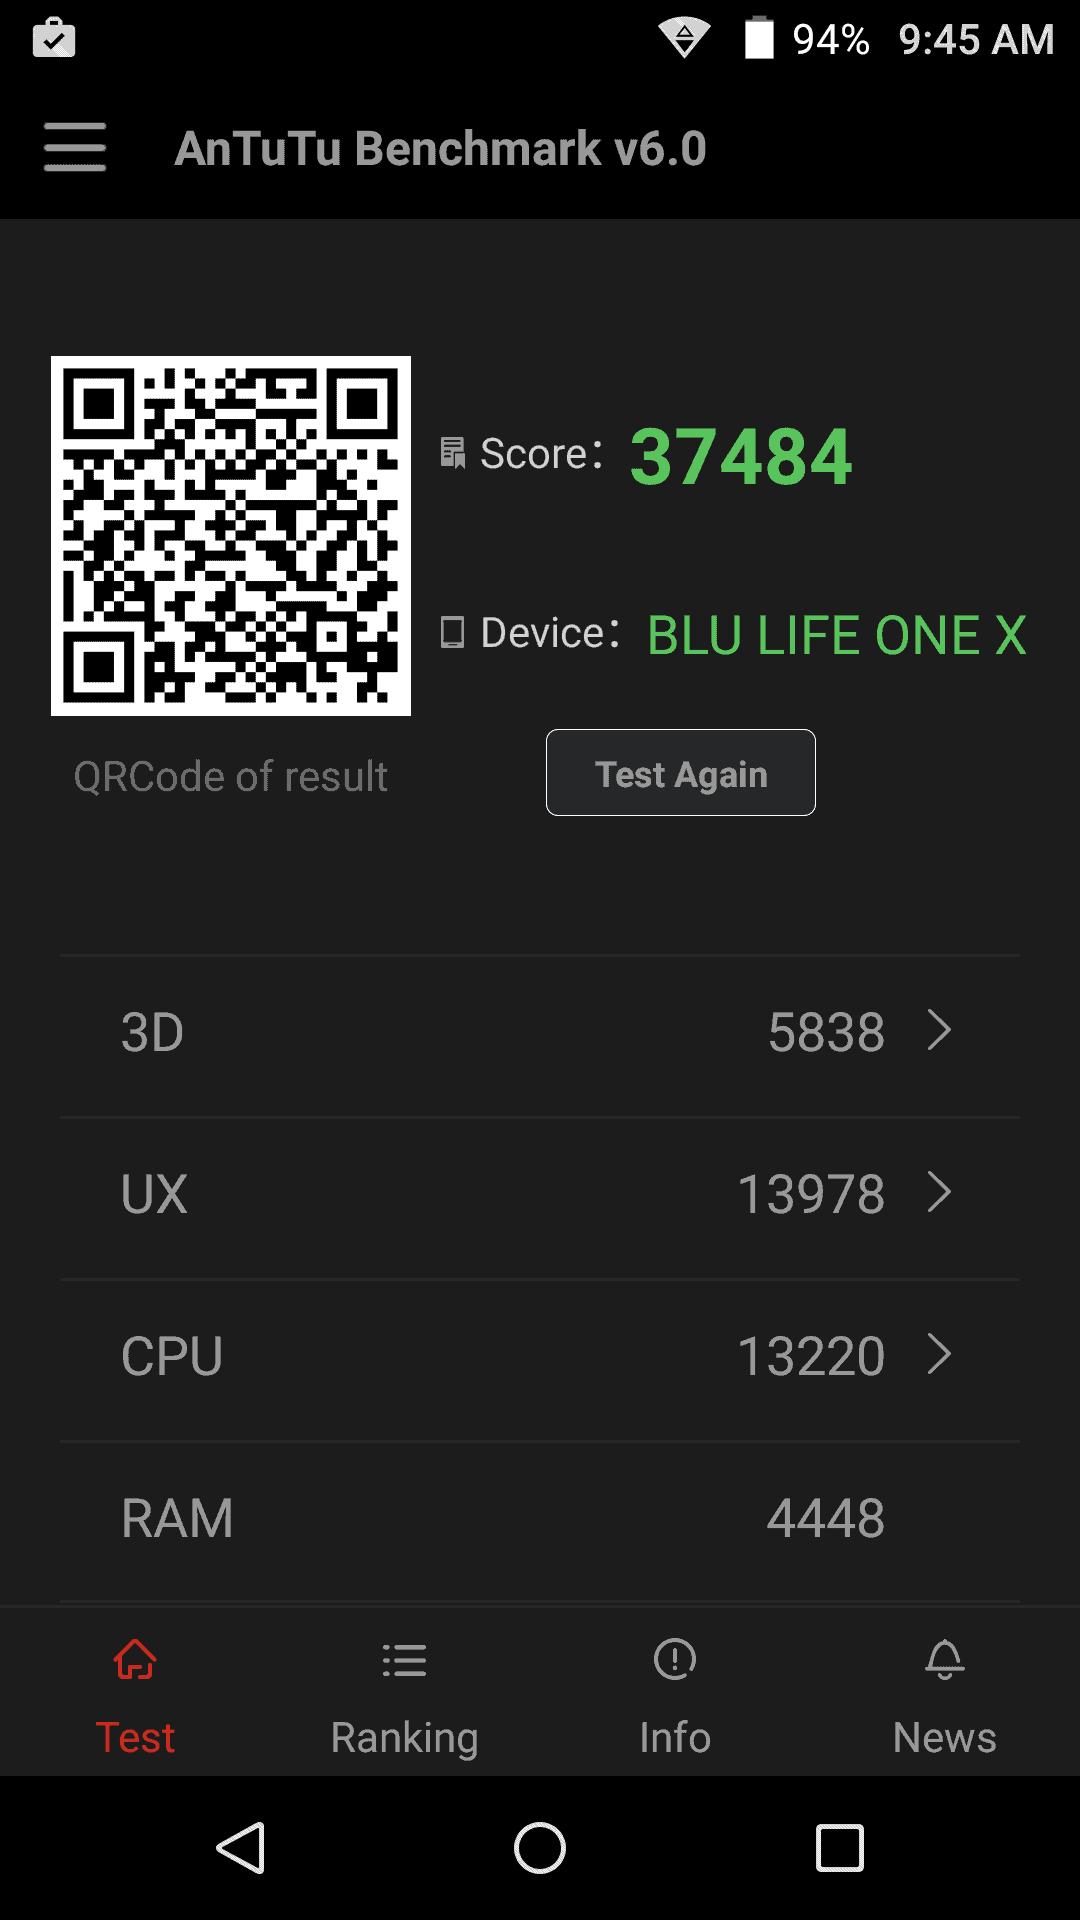 Screenshot 2015 12 27 09 45 57